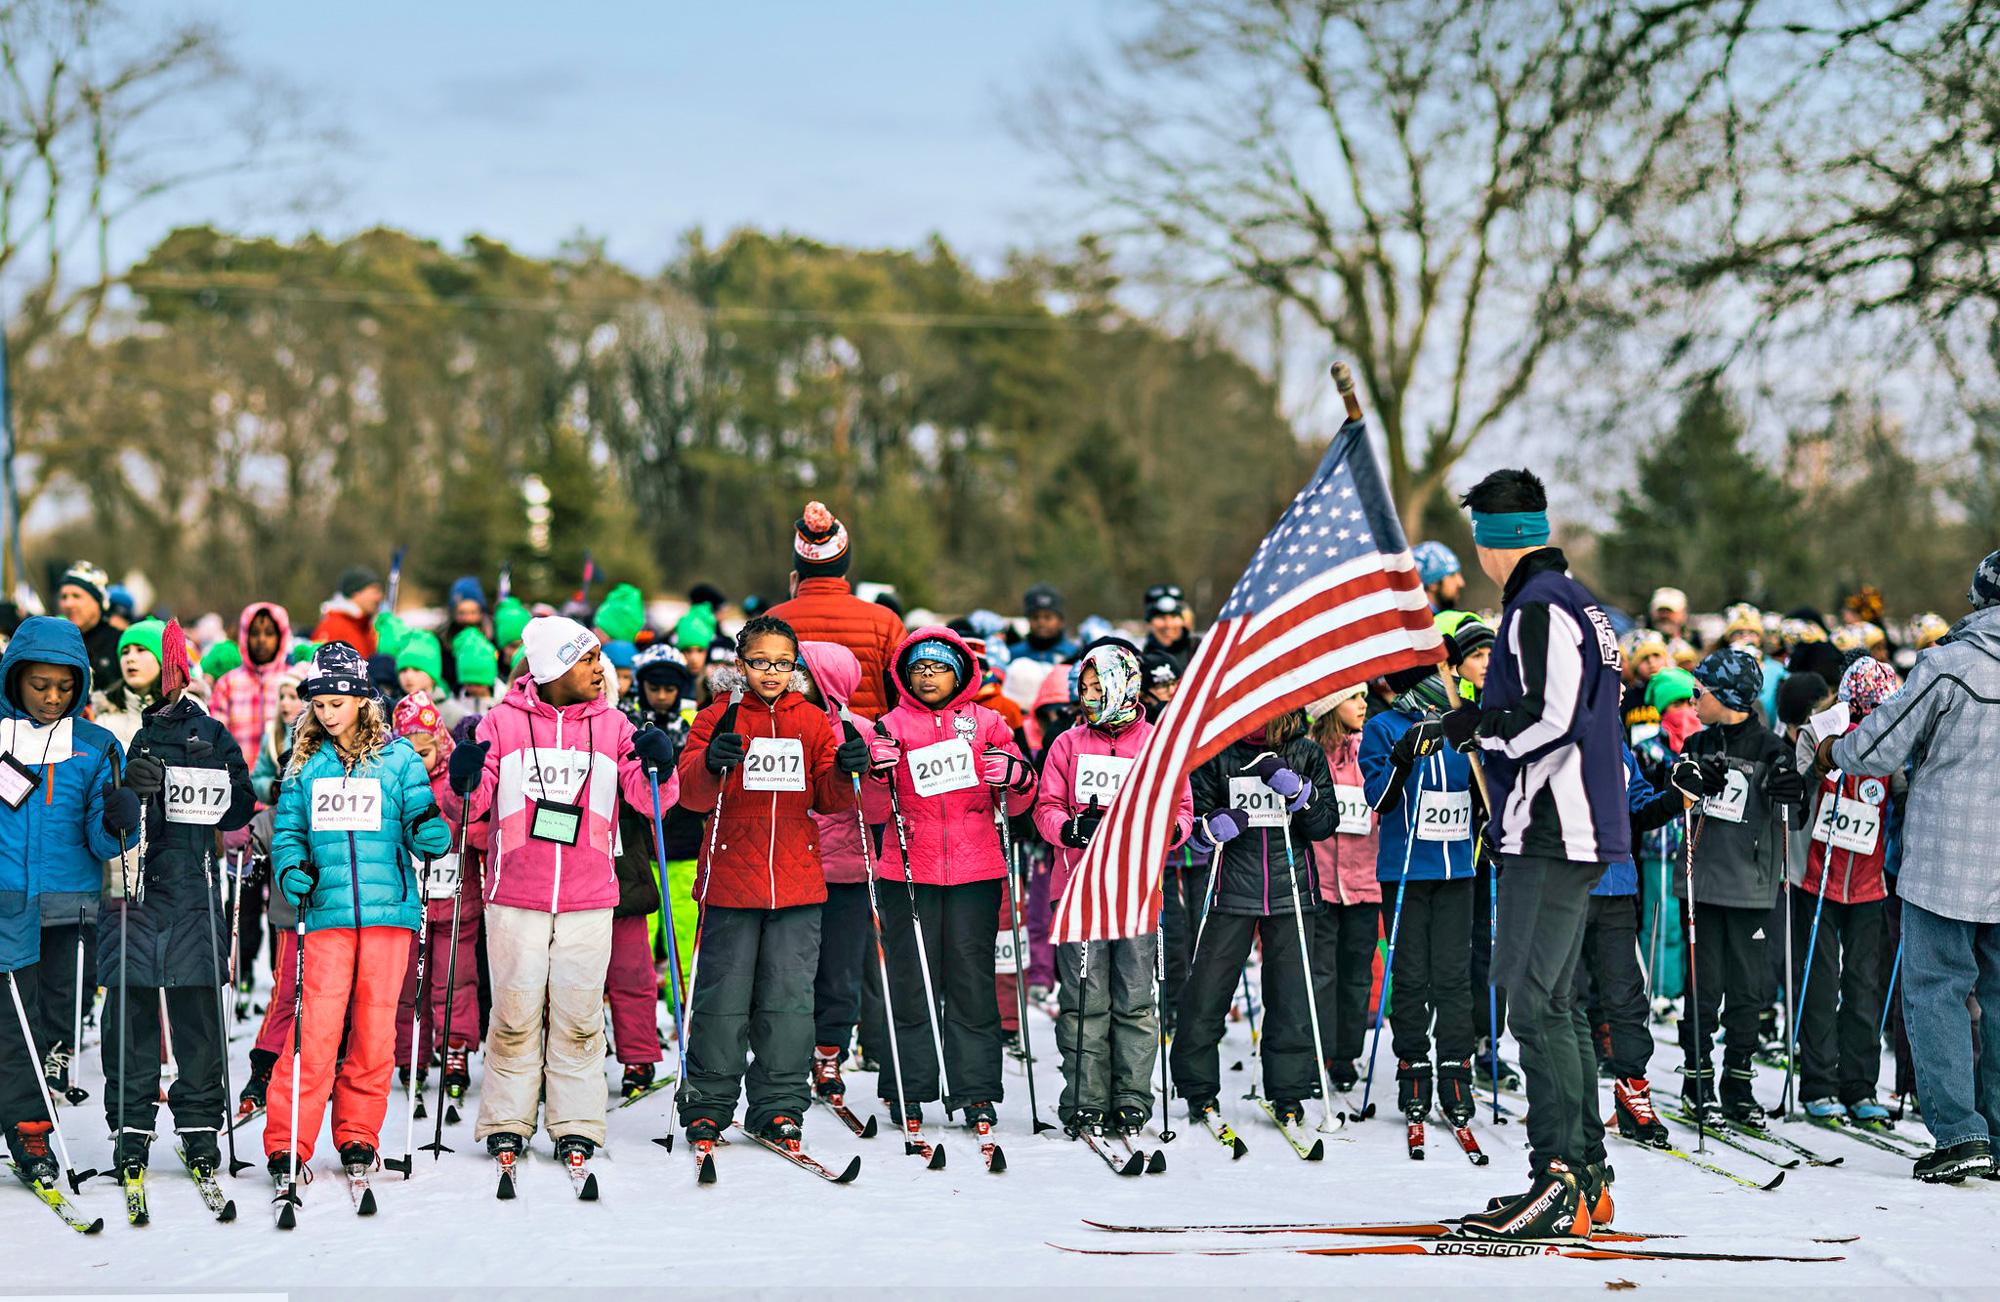 Loppet Ski Festival